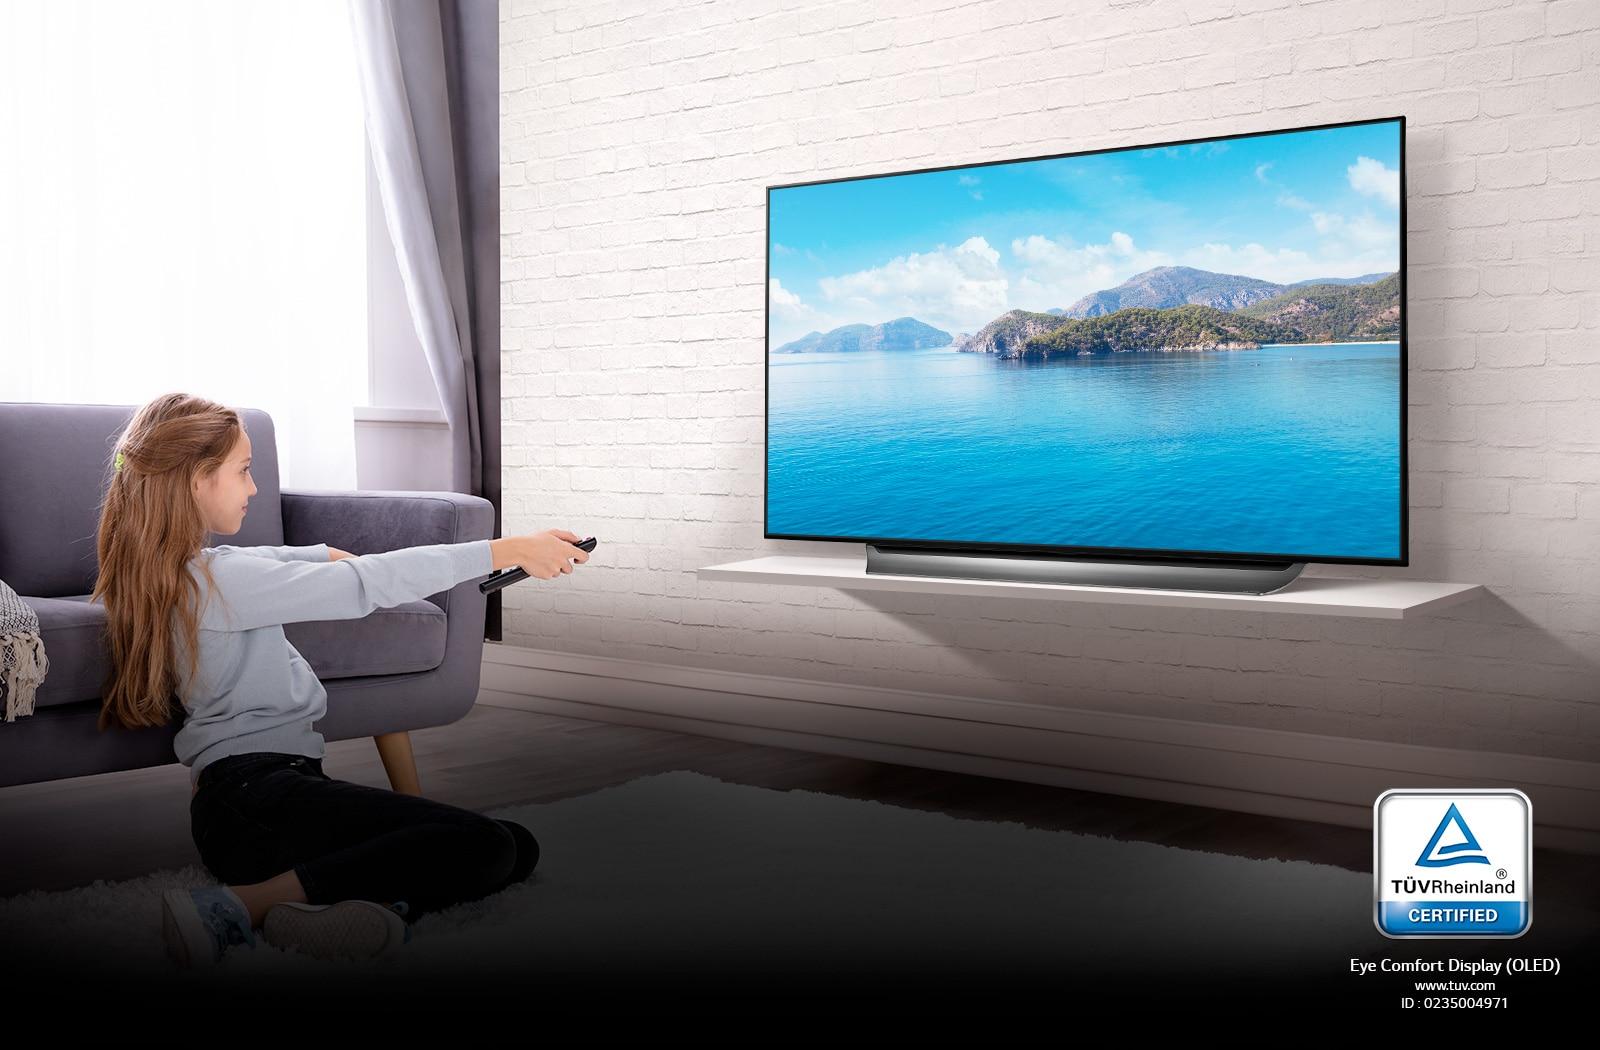 Udobna televizija - s certifikatom TÜV Rheinland